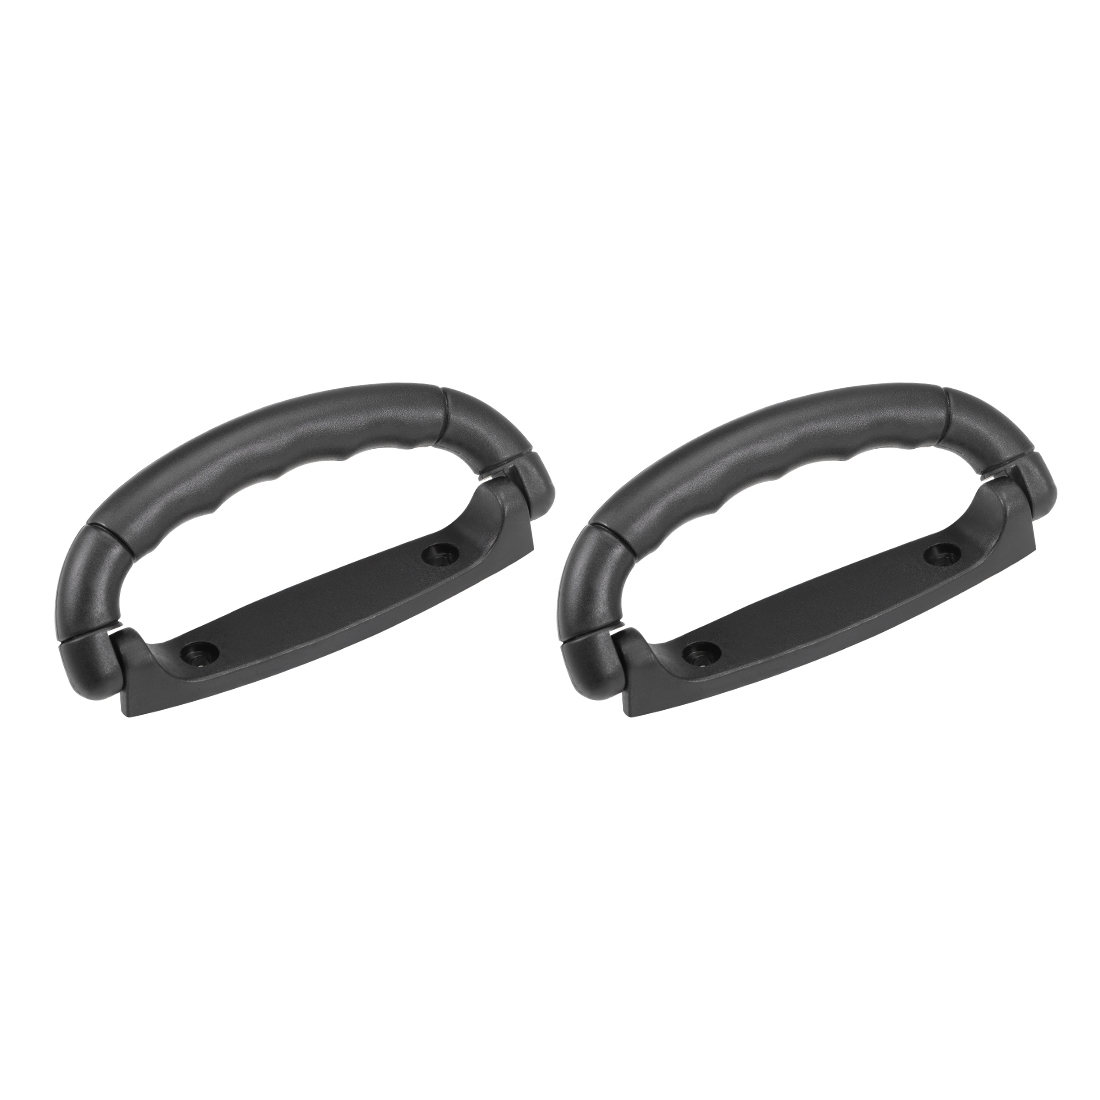 Luggage Handle Pull Plastic 4.92-Inch Length Suitcase Handle Grip Black 2 Pcs